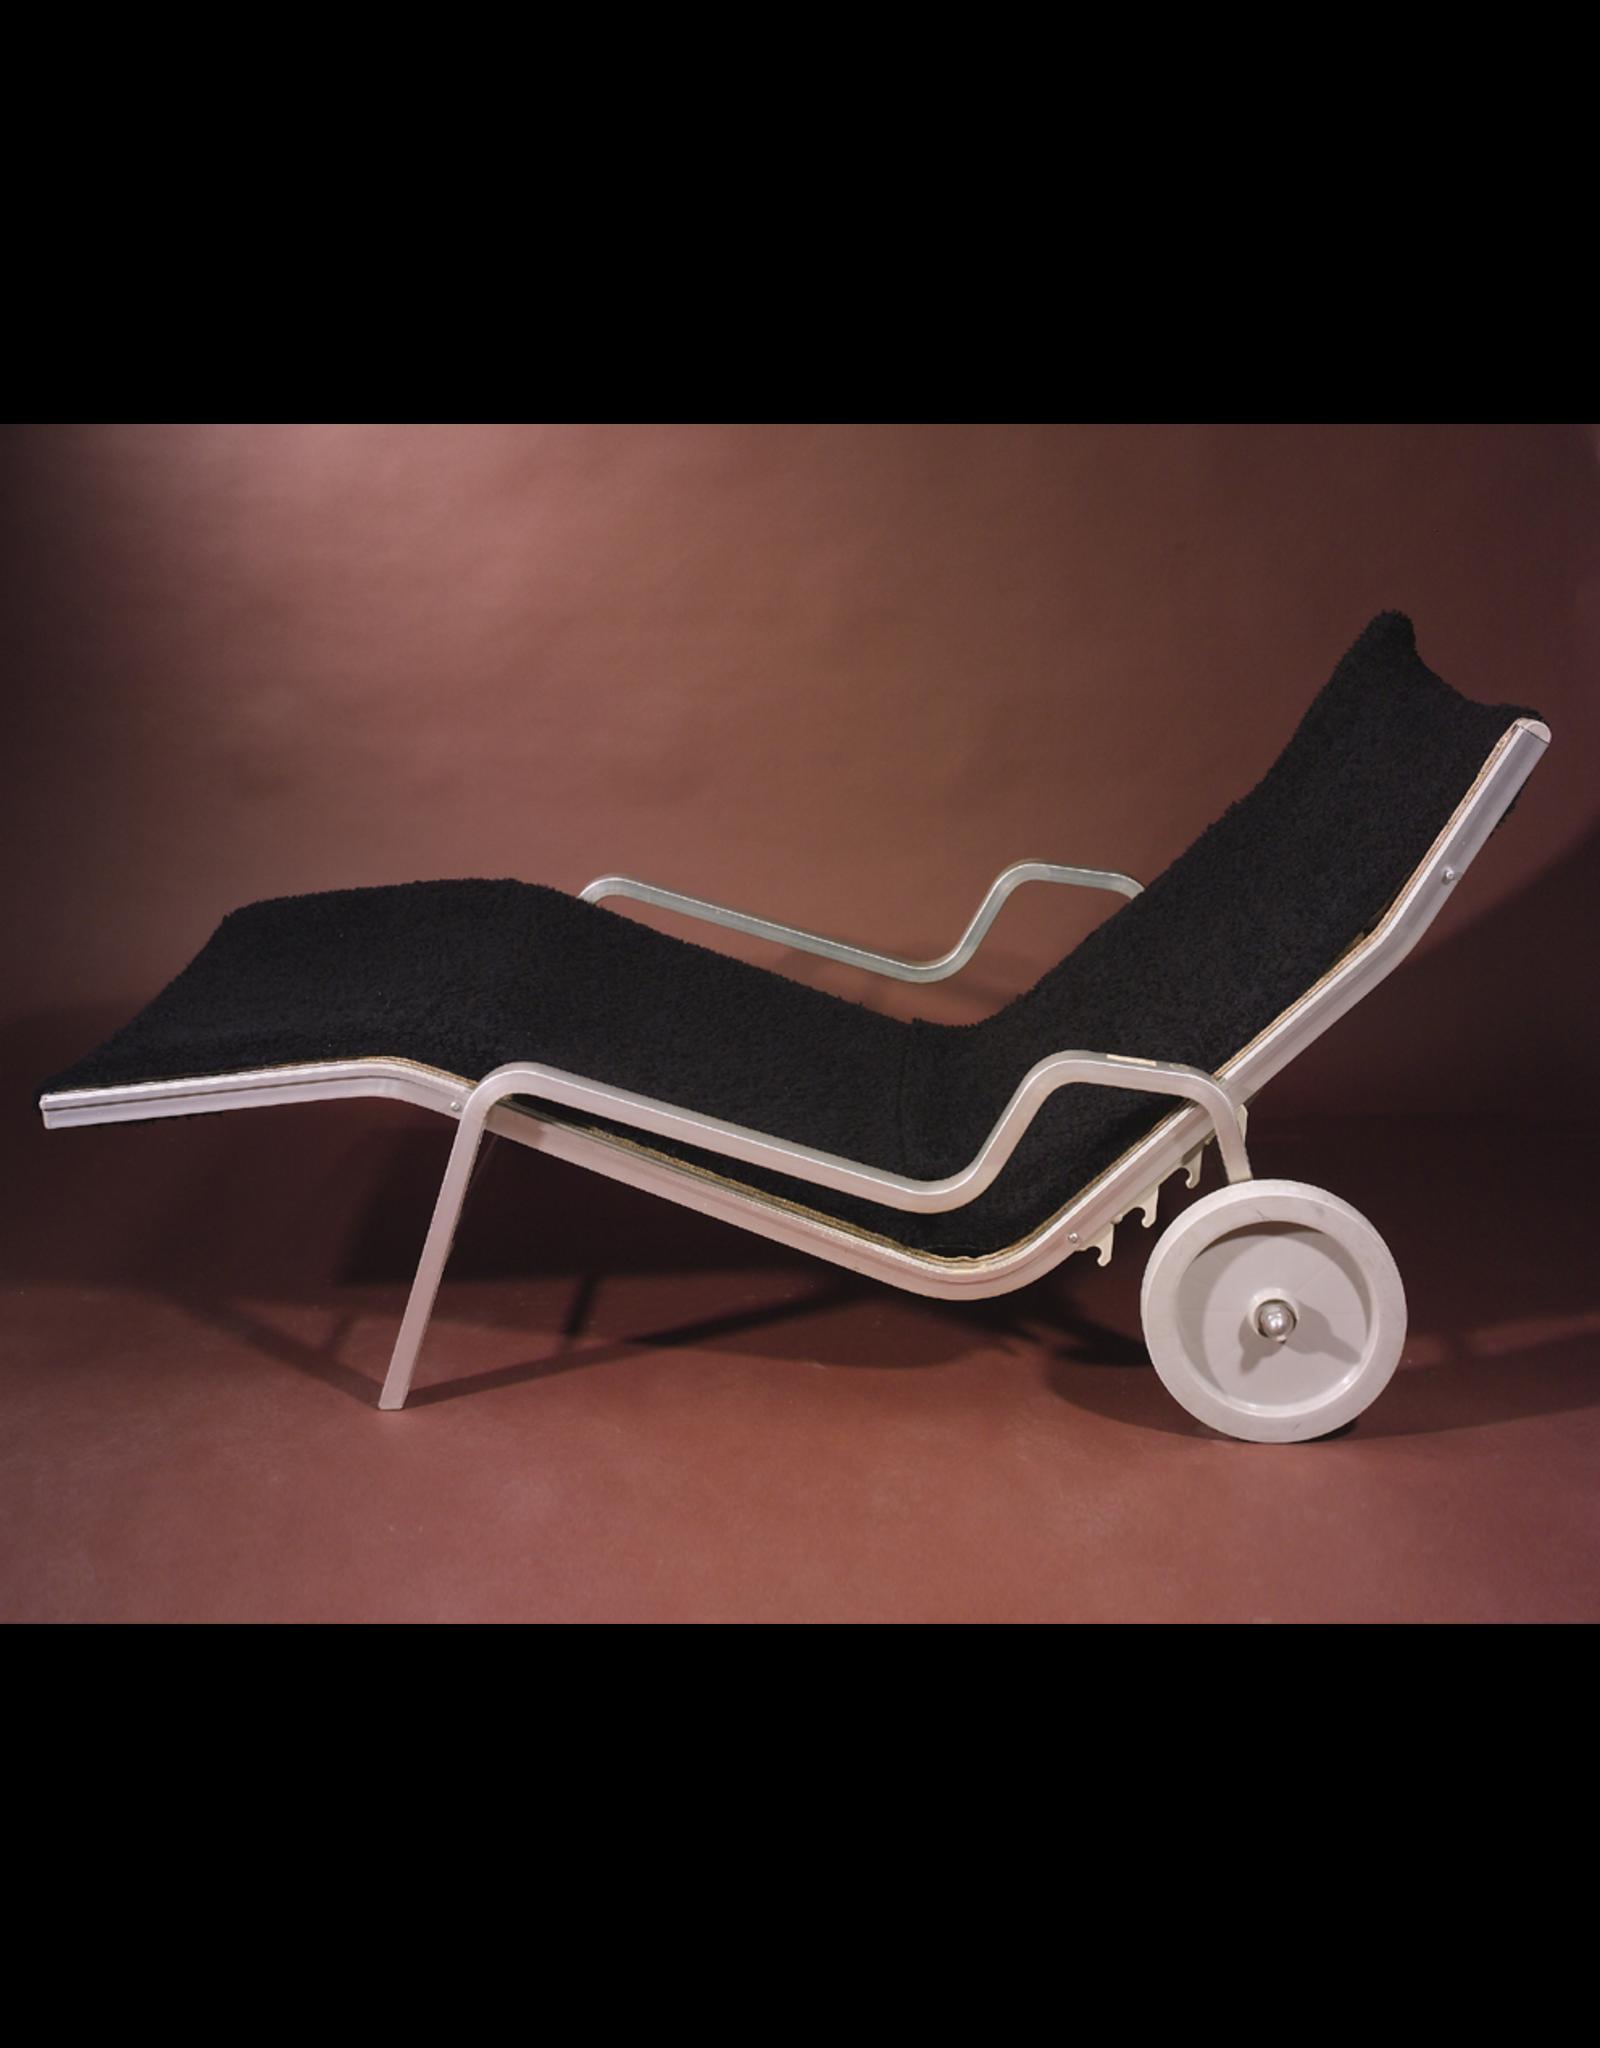 MANKS ANTIQUES BLACK POODLE 有车轮黑色卷毛躺椅